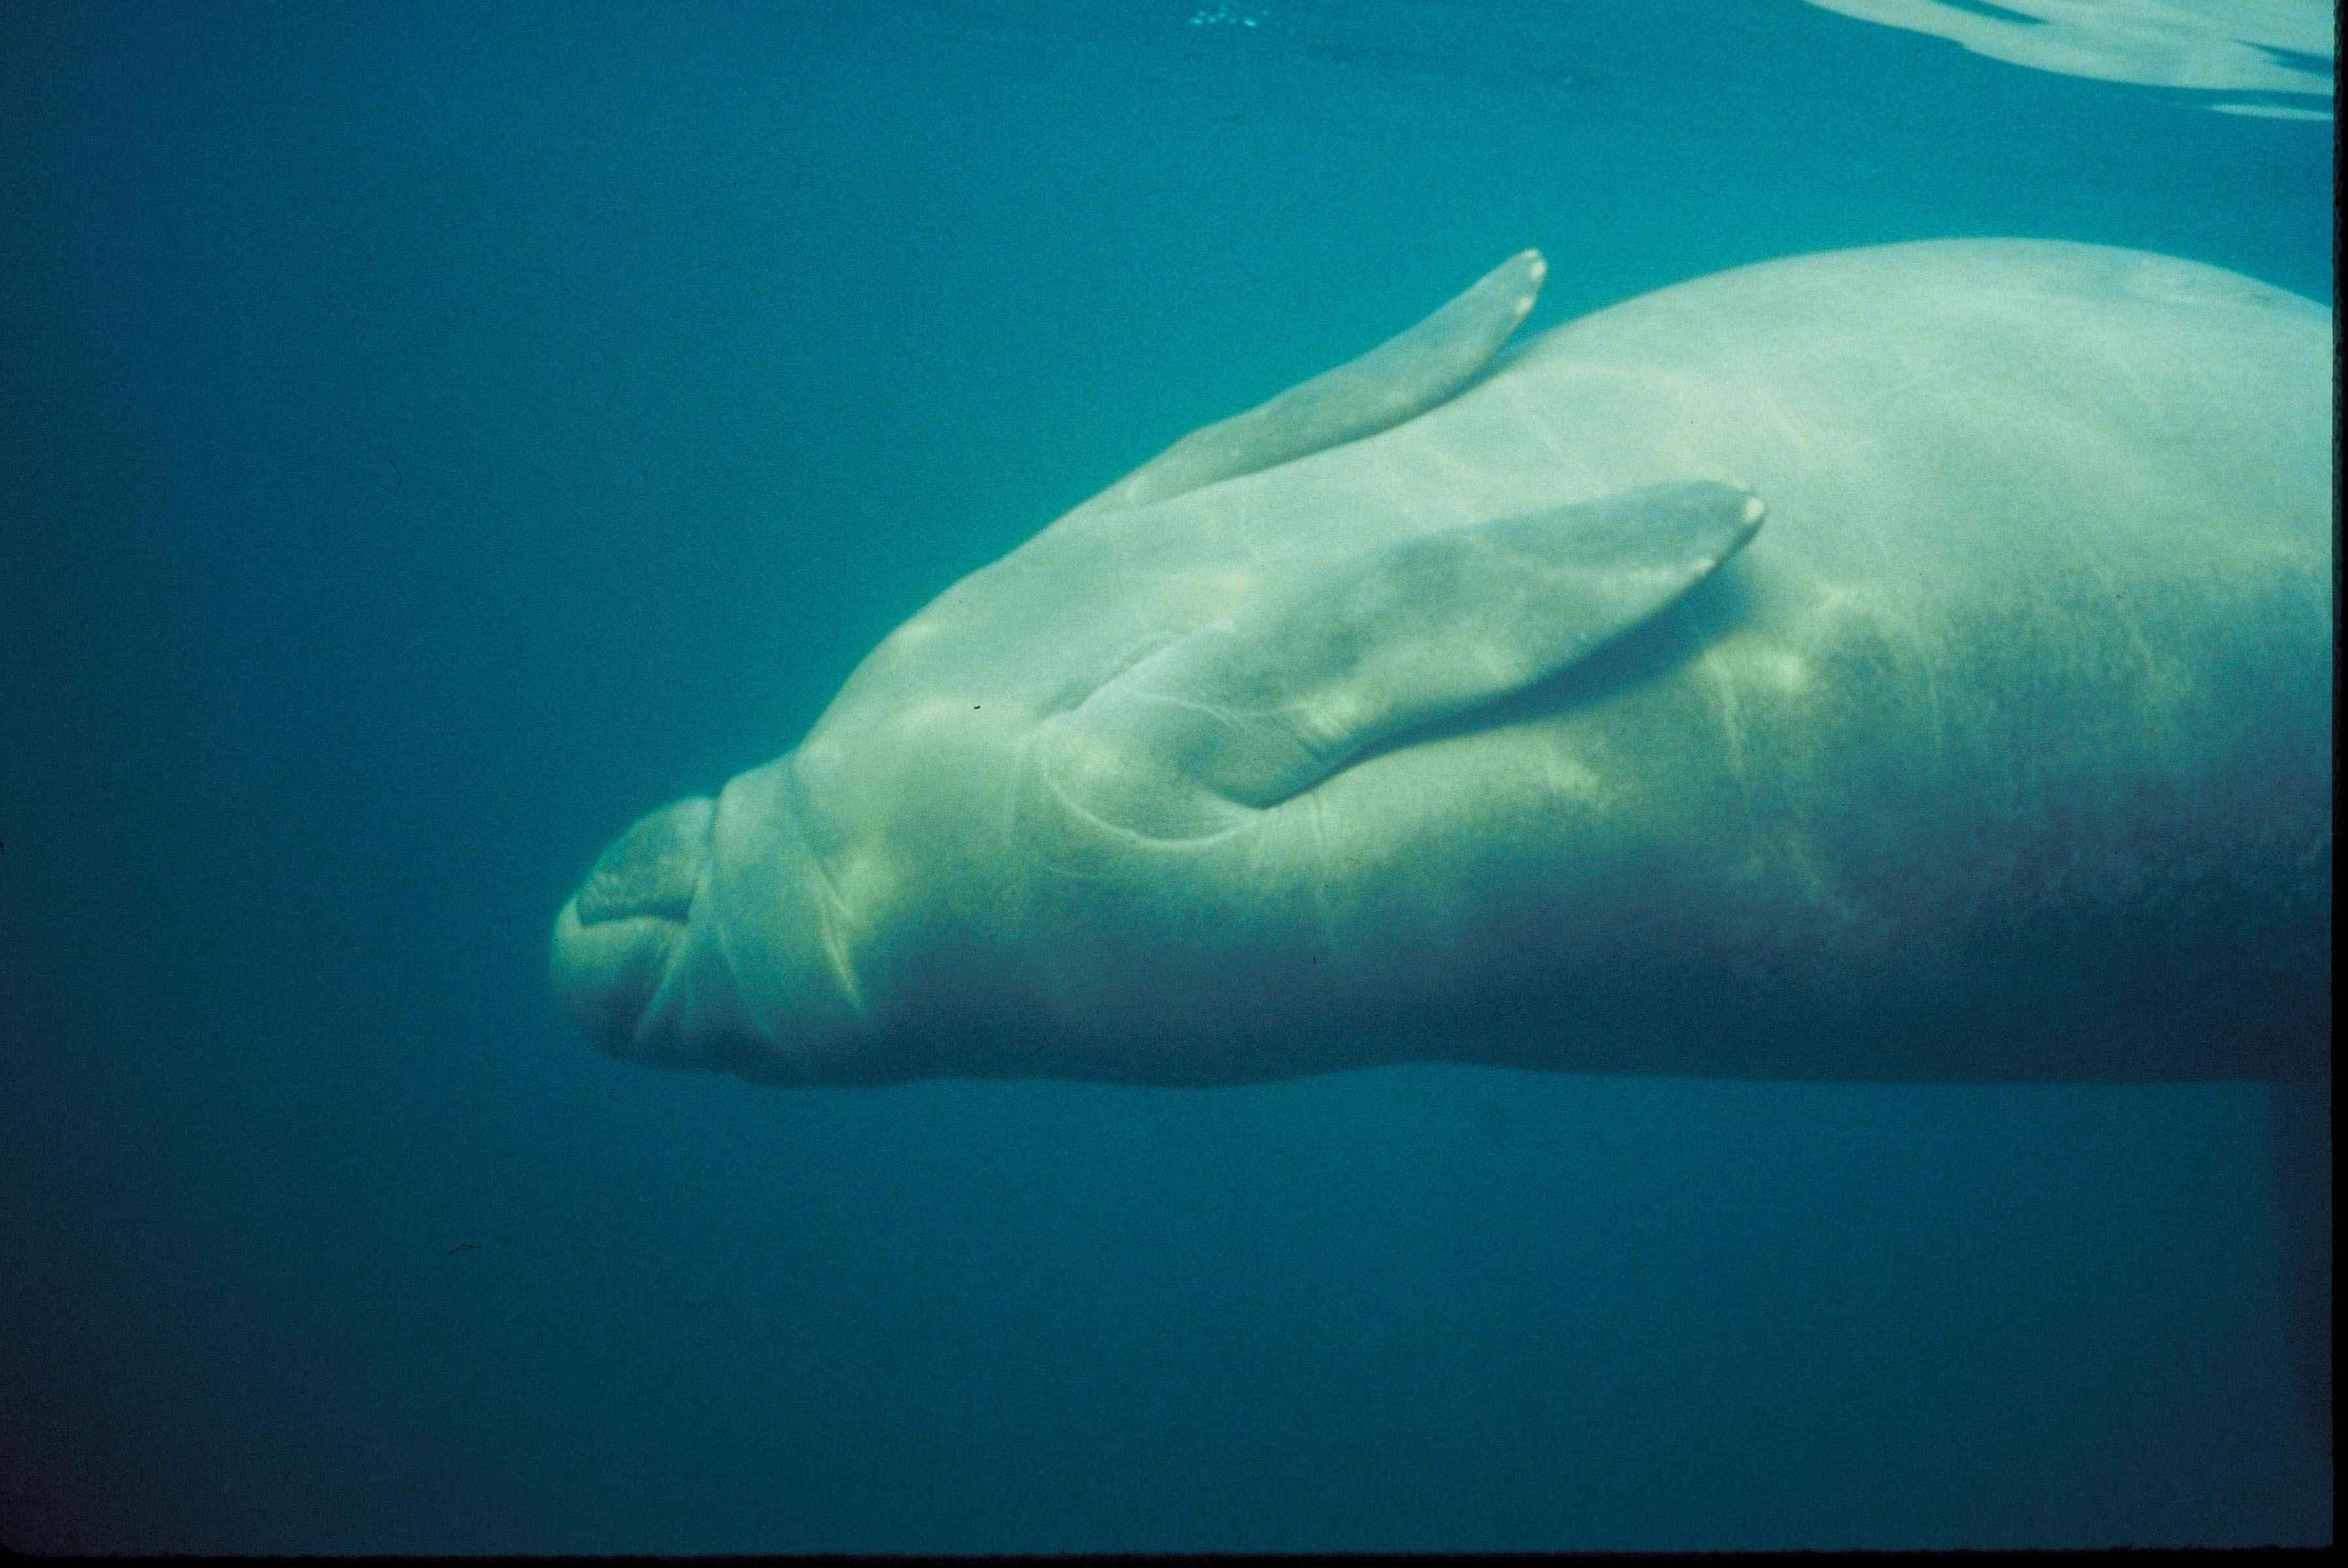 52 Gambar Hewan Mamalia Laut HD Terbaik